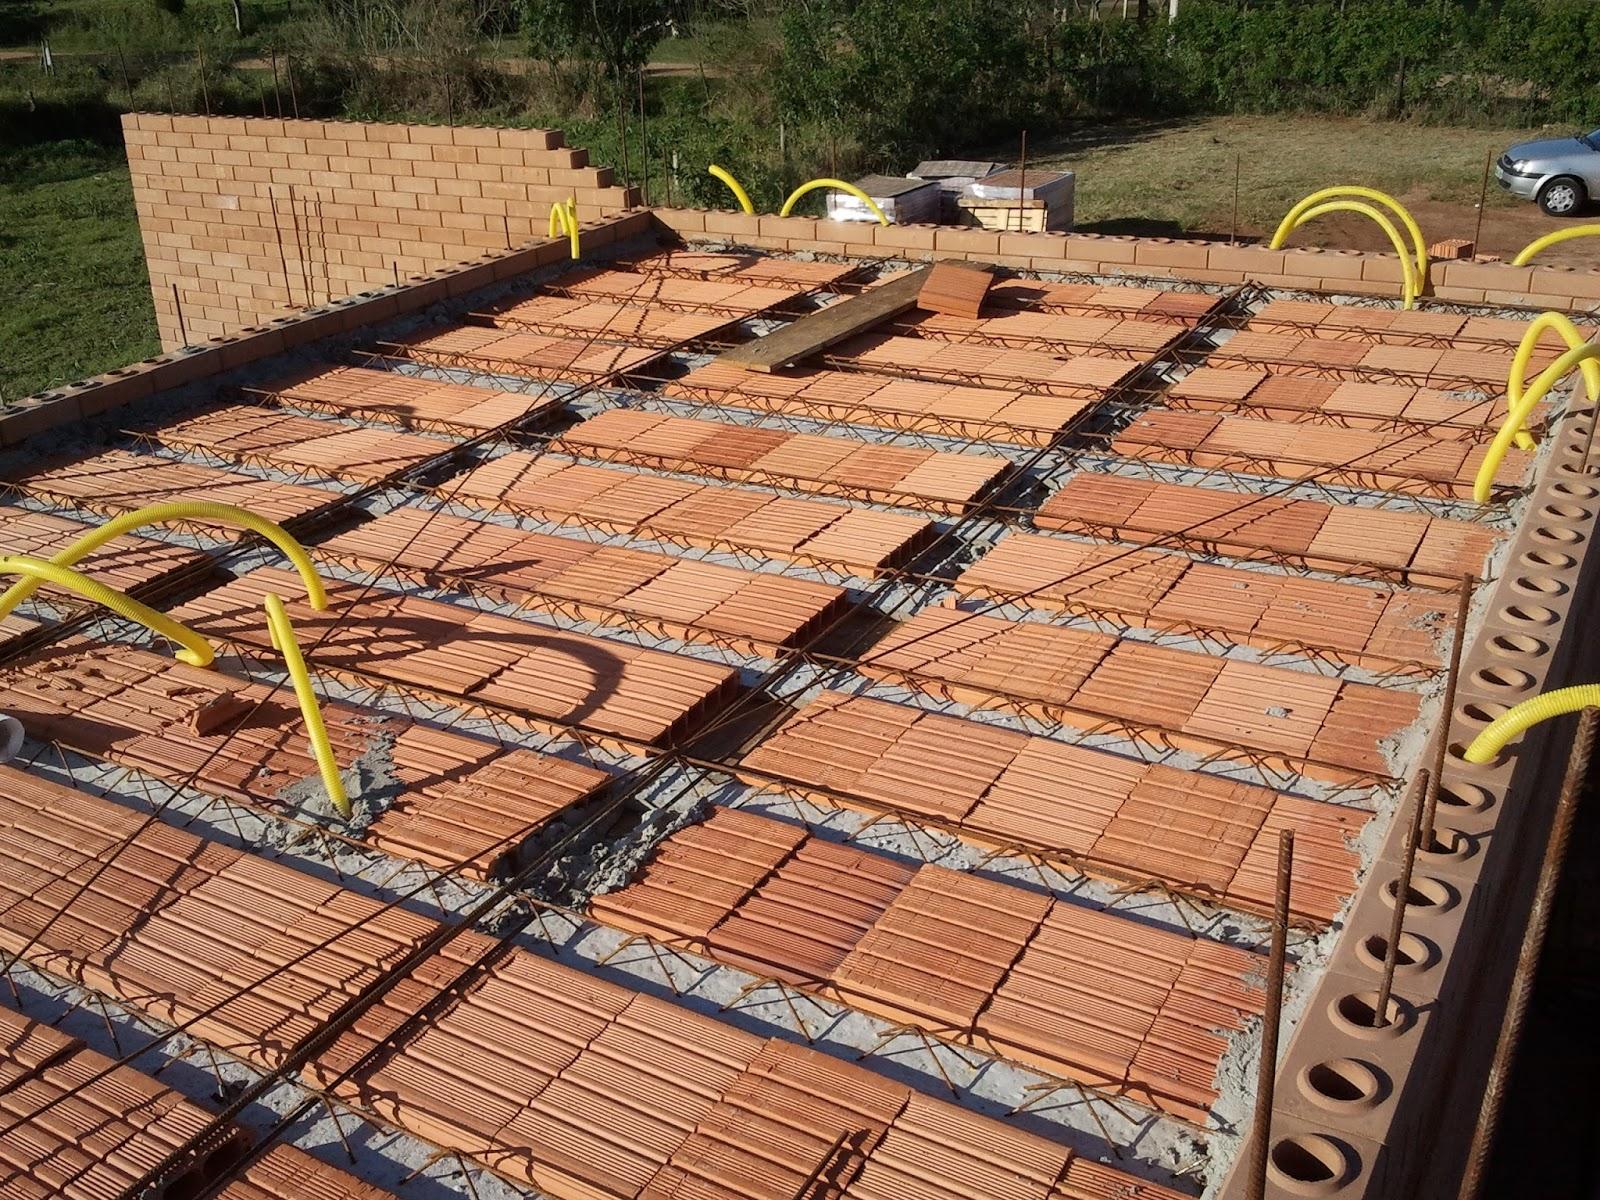 Construindo e Ampliando com Tijolo Solo cimento / Ecológico: Laje 3 #A99622 1600x1200 Banheiro Com Tijolo Ecologico